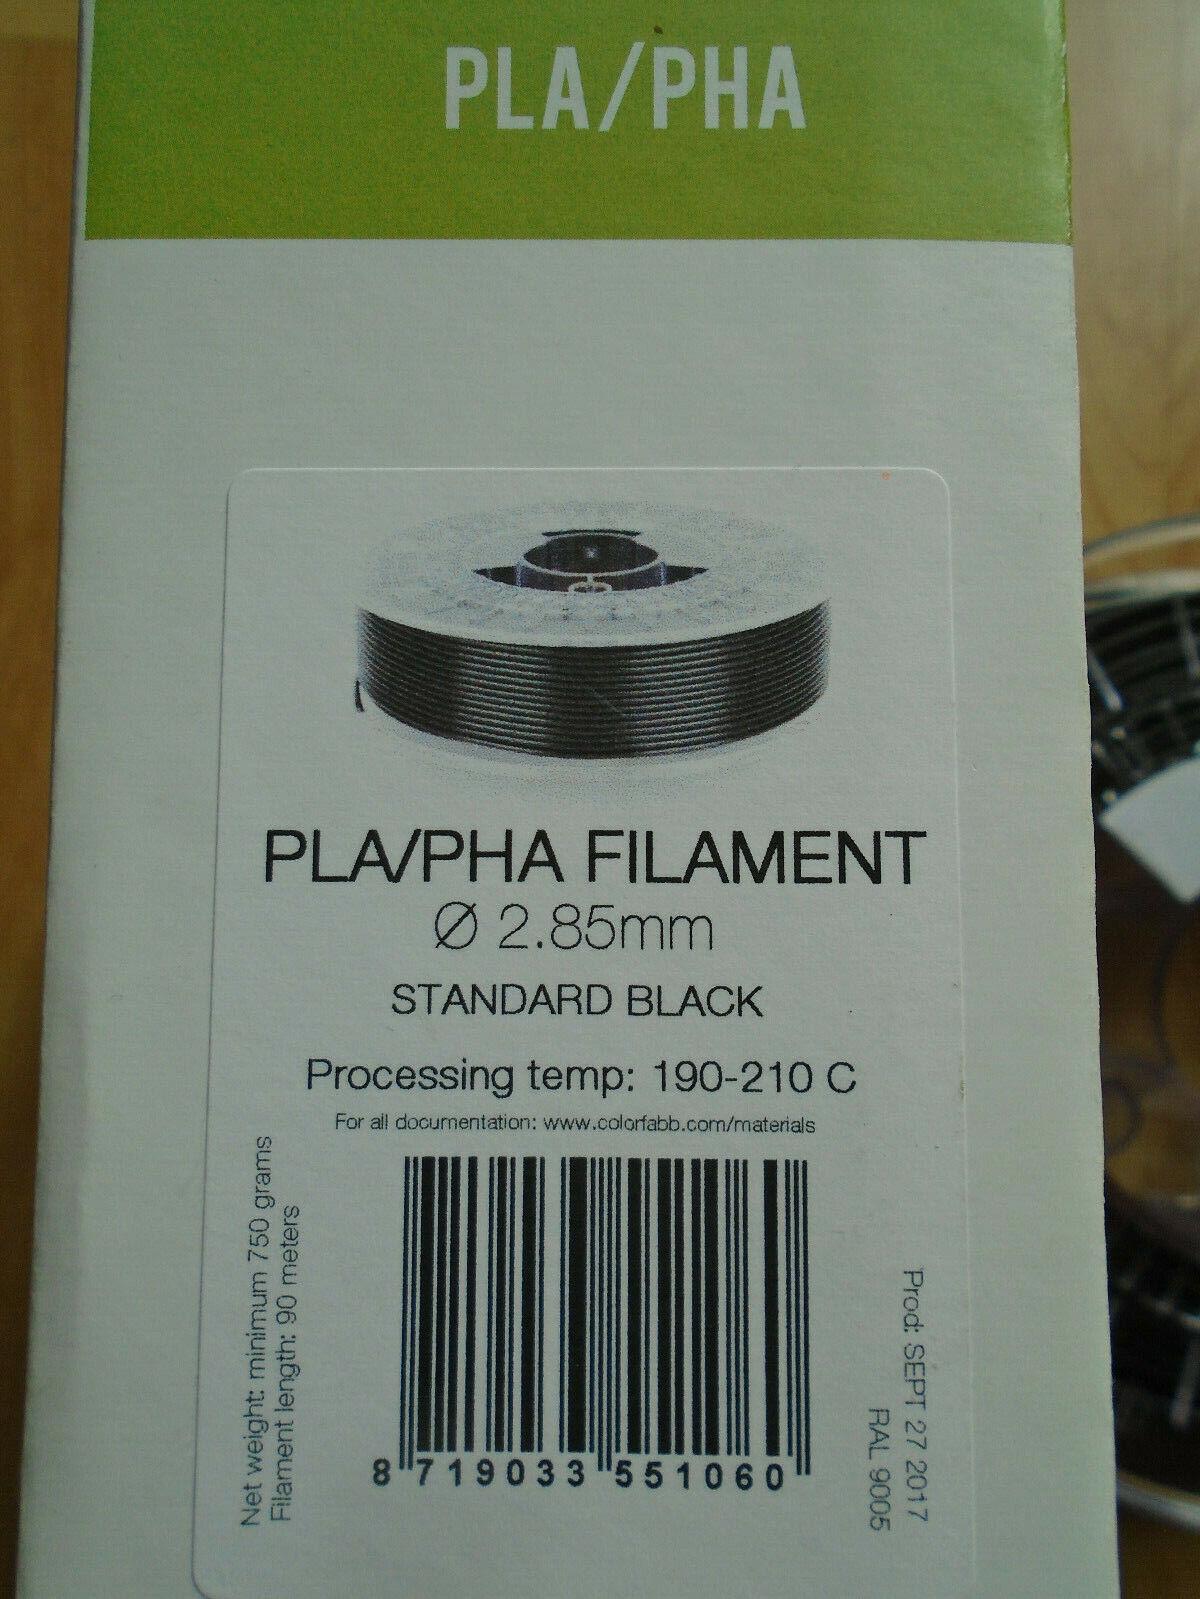 3D Filament - PLA / PHA - ColorFabb - Black - 2,85mm - ca 600g v. 750g Spule